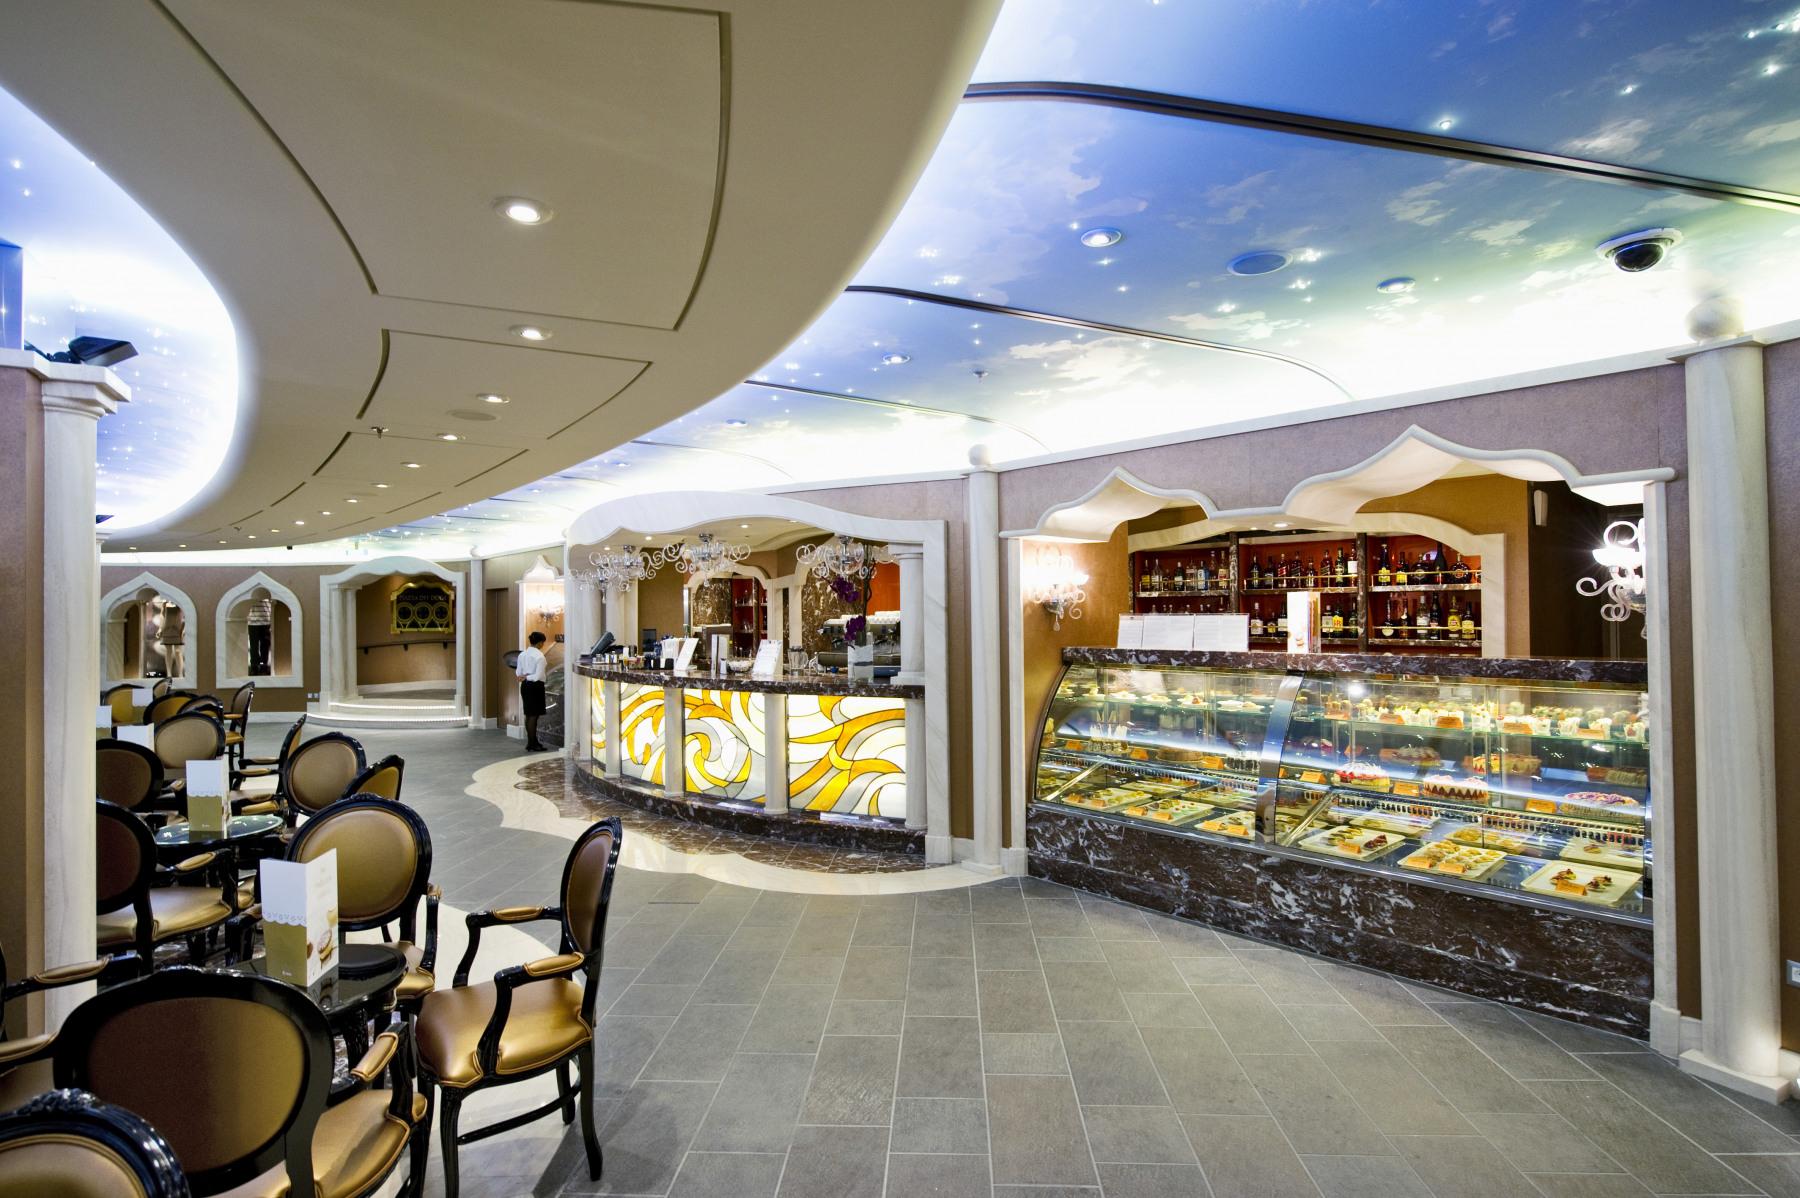 MSC Fantasia Class Icecream bar.jpg